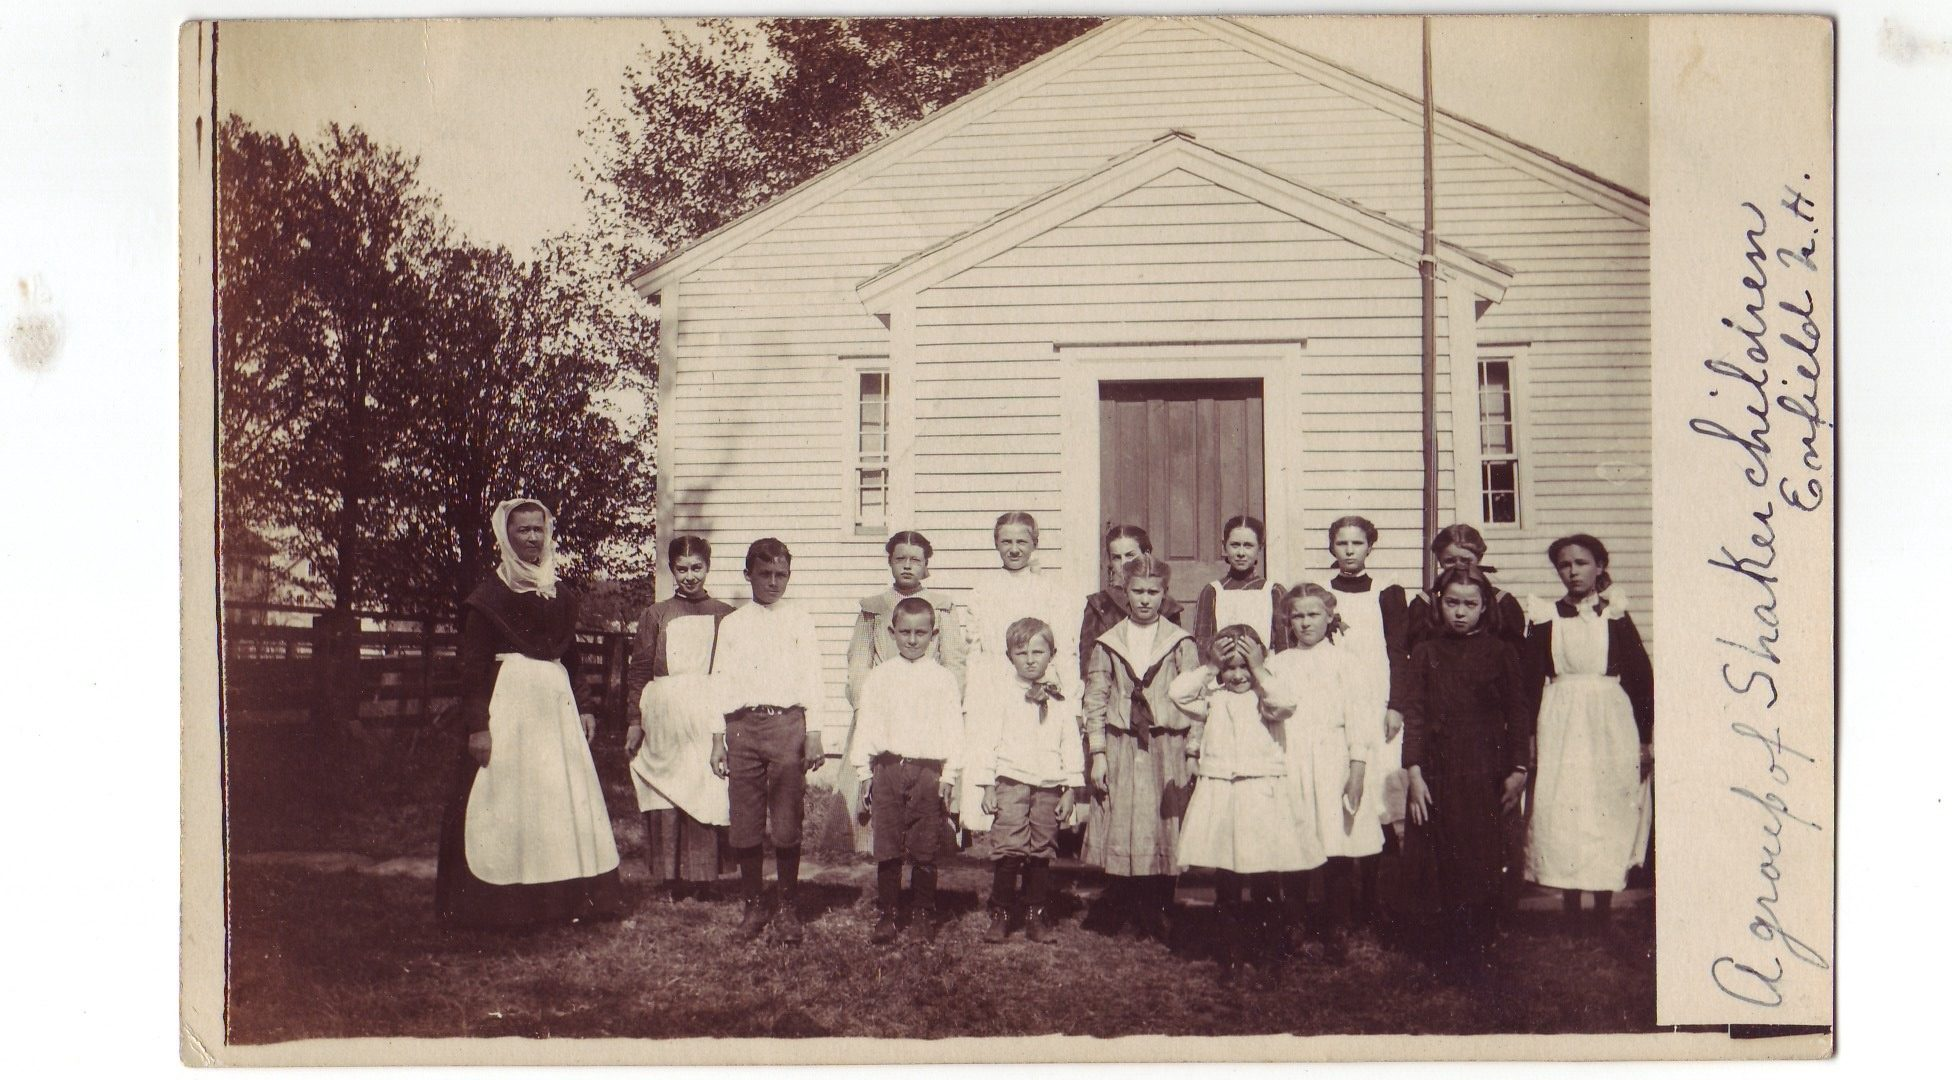 Enfield Shaker School Children with Sister Fanny Fallon